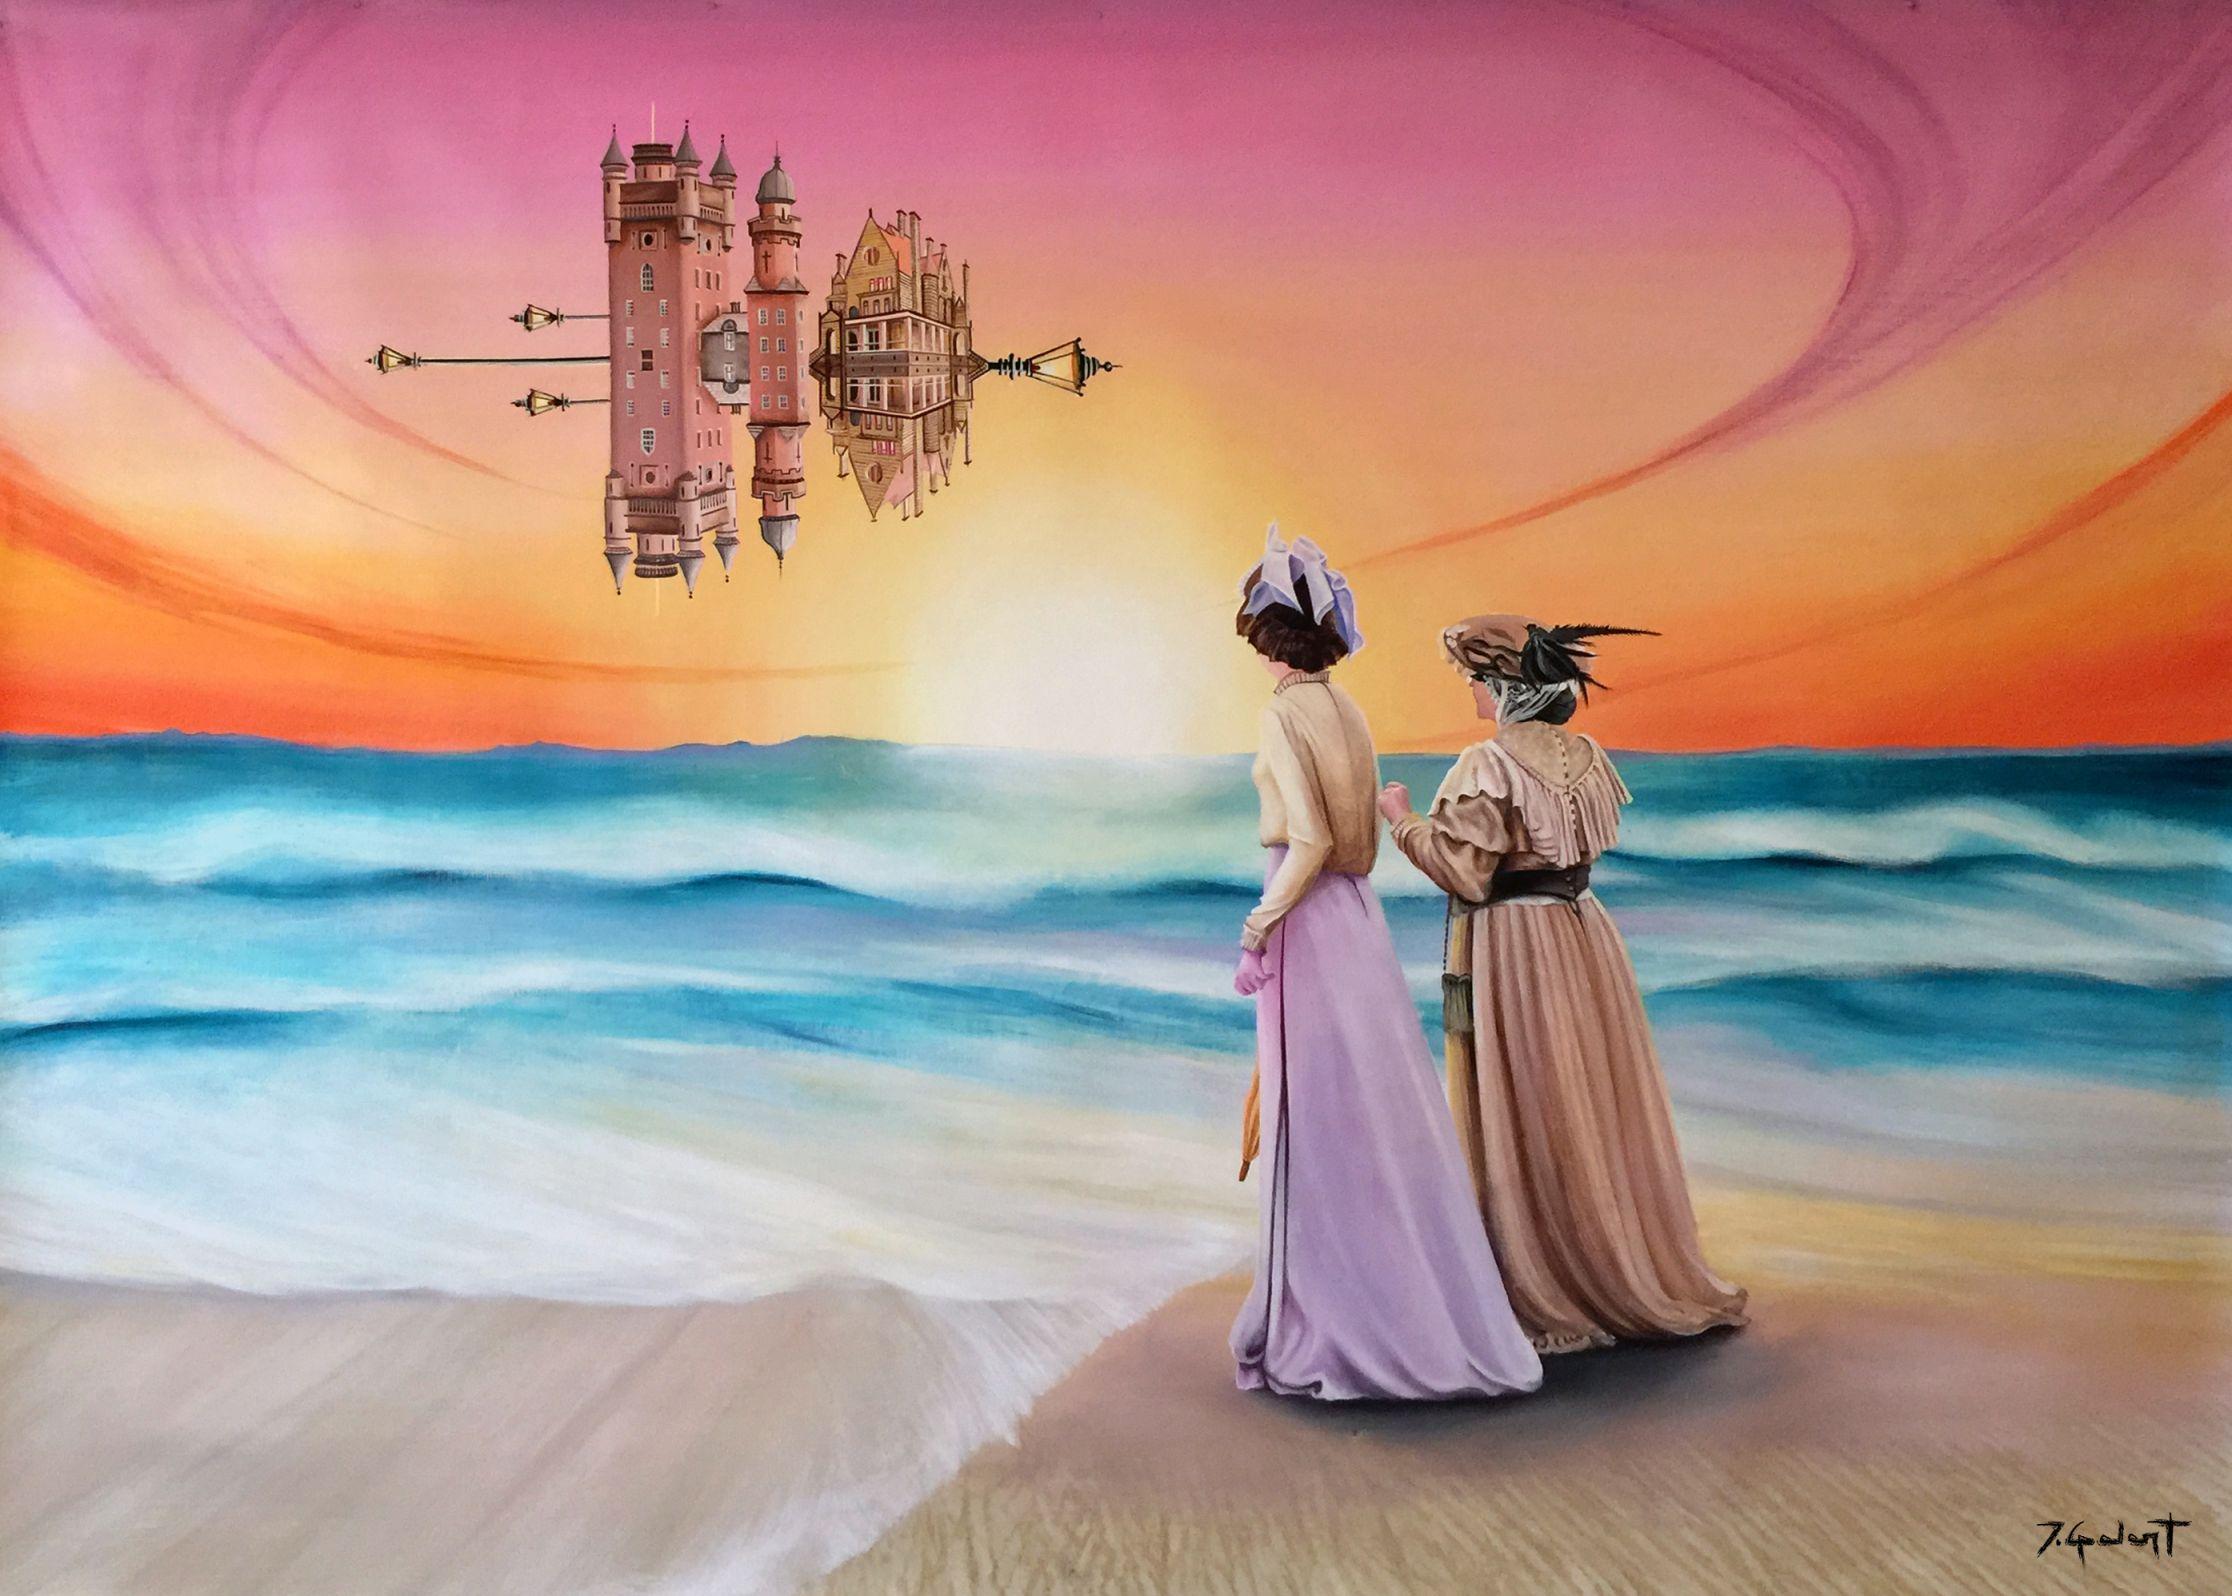 Visiting The Victorian Spaceship's Beach (2016) - José Galant